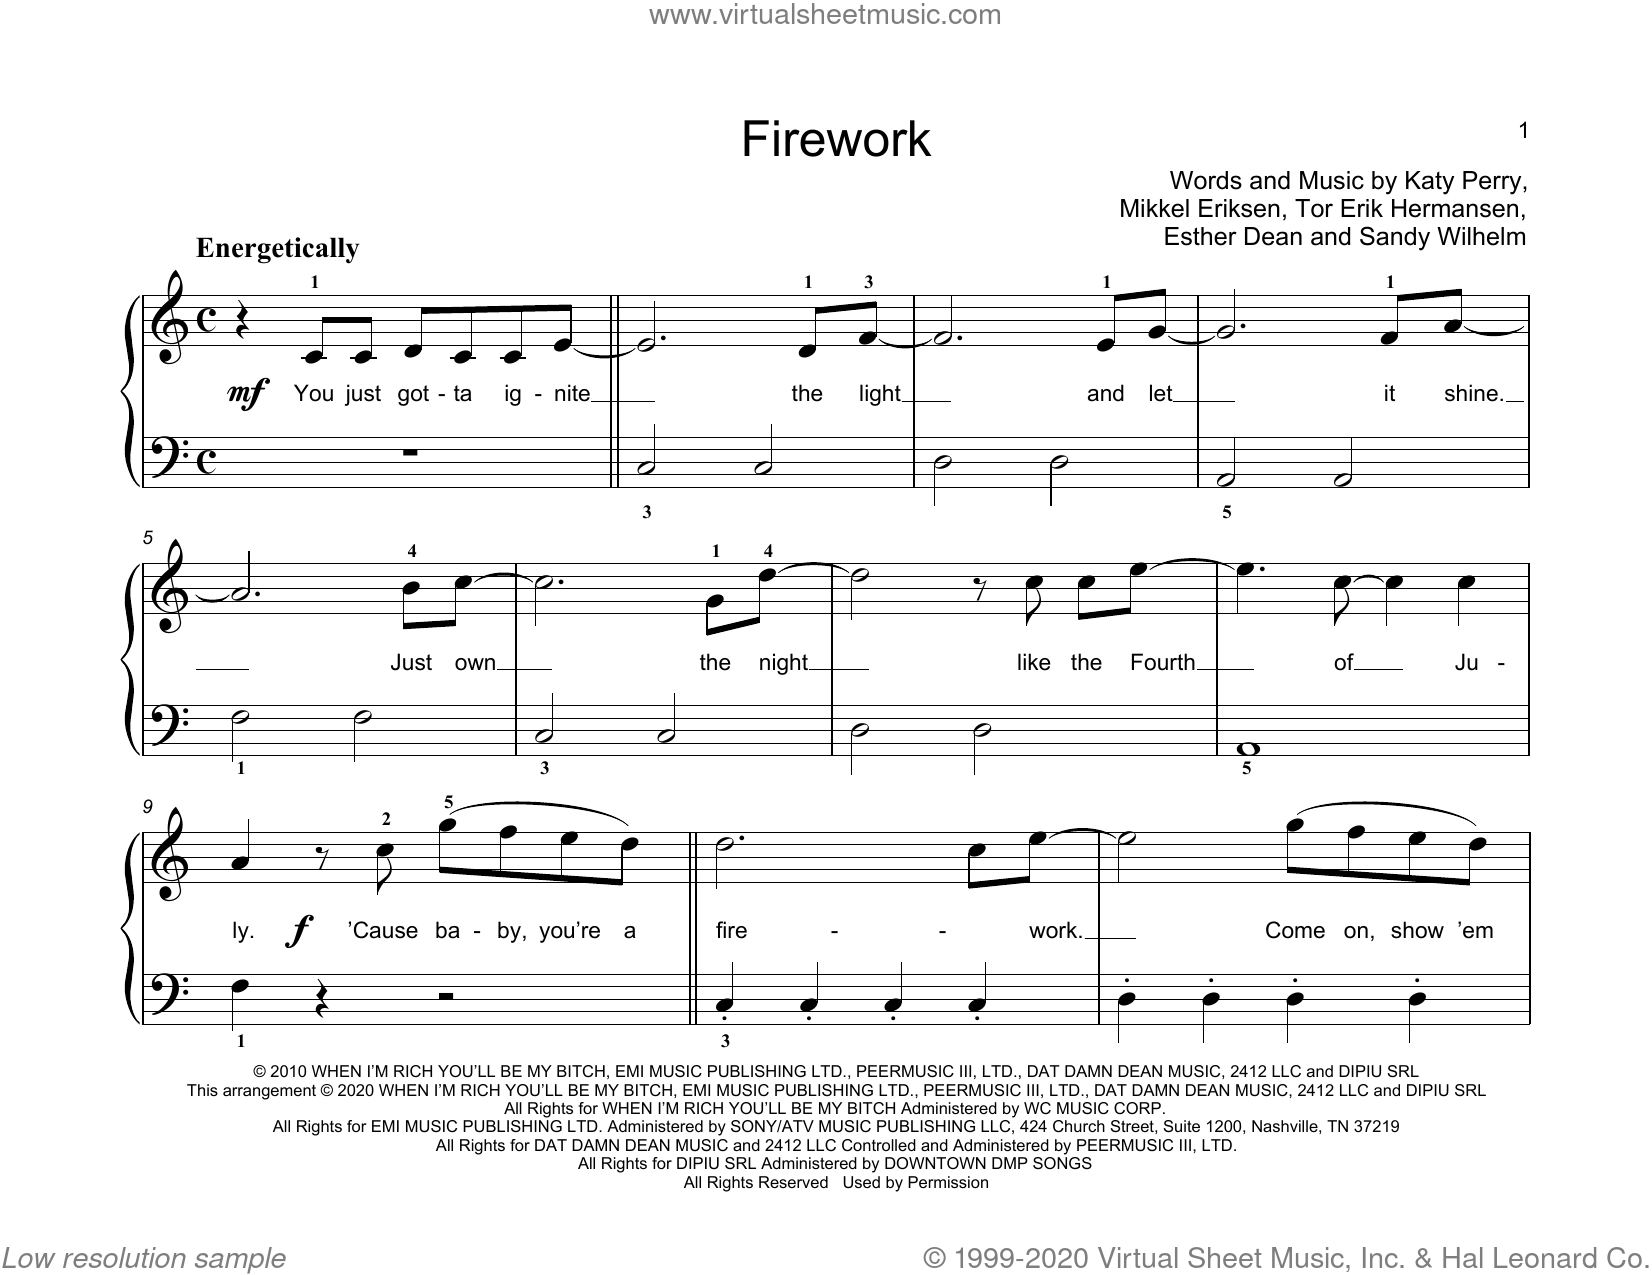 Firework sheet music for piano solo (elementary) by Katy Perry, John Thompson, Ester Dean, Mikkel Eriksen, Sandy Wilhelm and Tor Erik Hermansen, beginner piano (elementary)